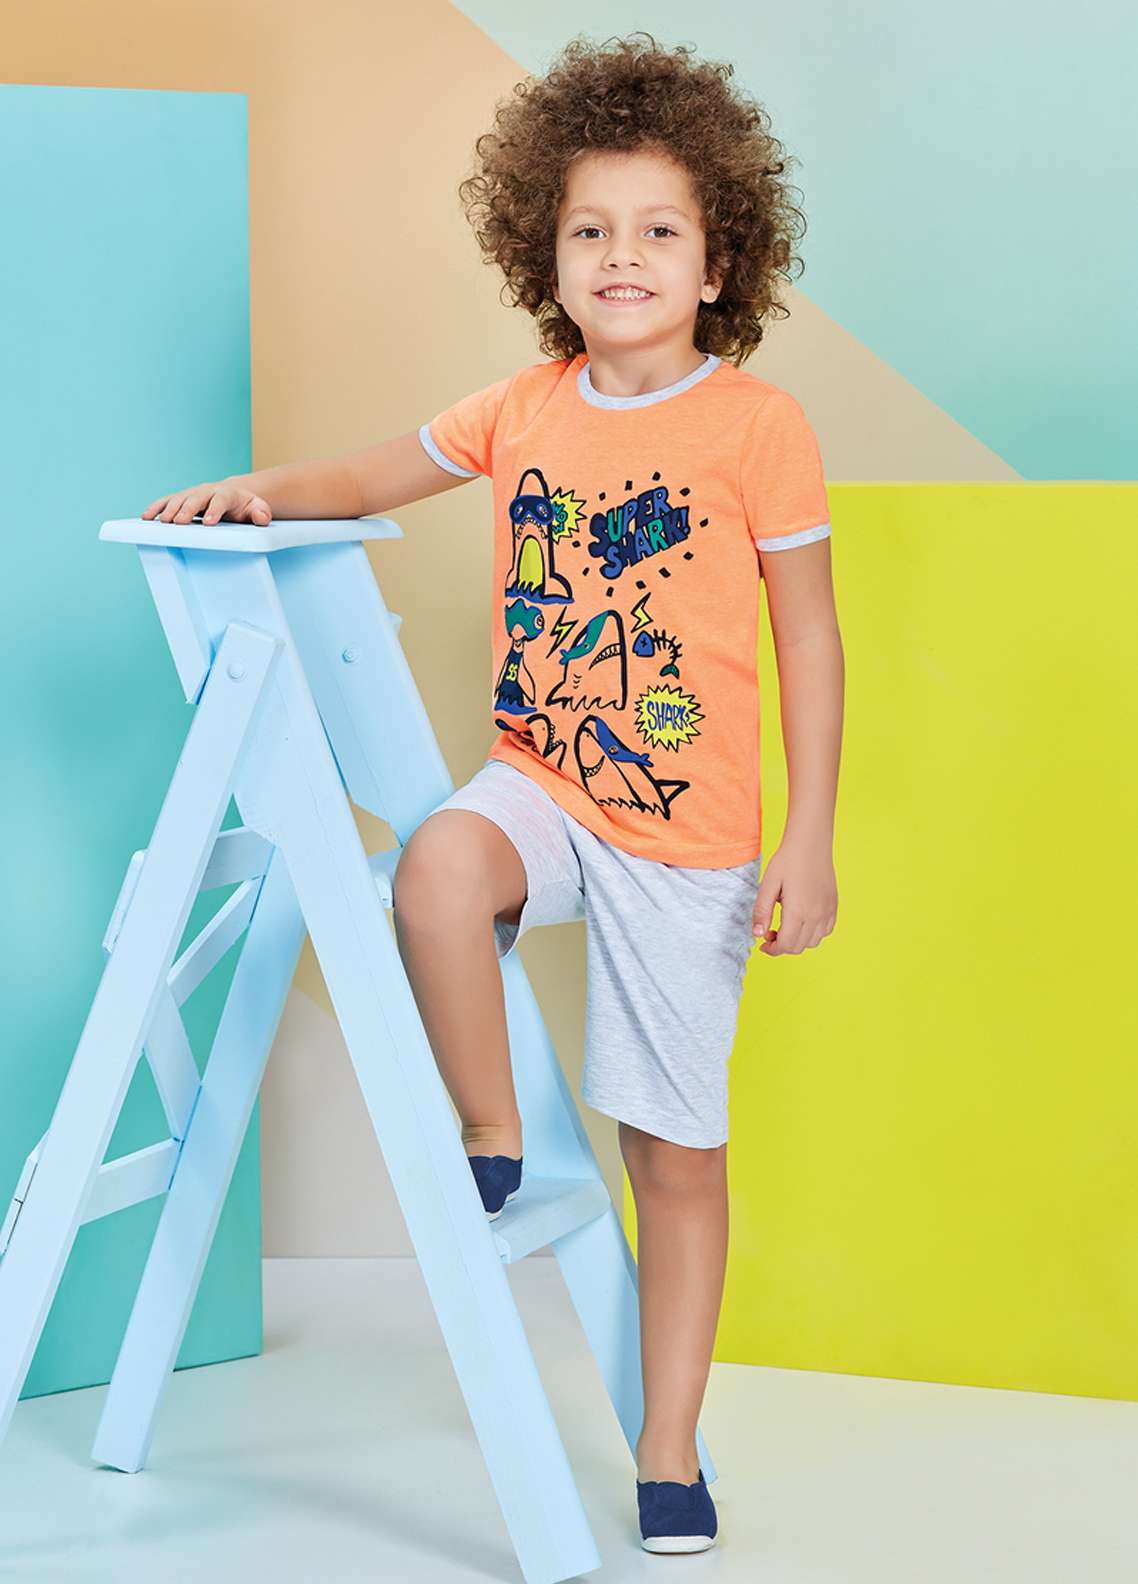 Cotton Net Nightwear for Kids 2 Piece NS18K 1213 ORANGE